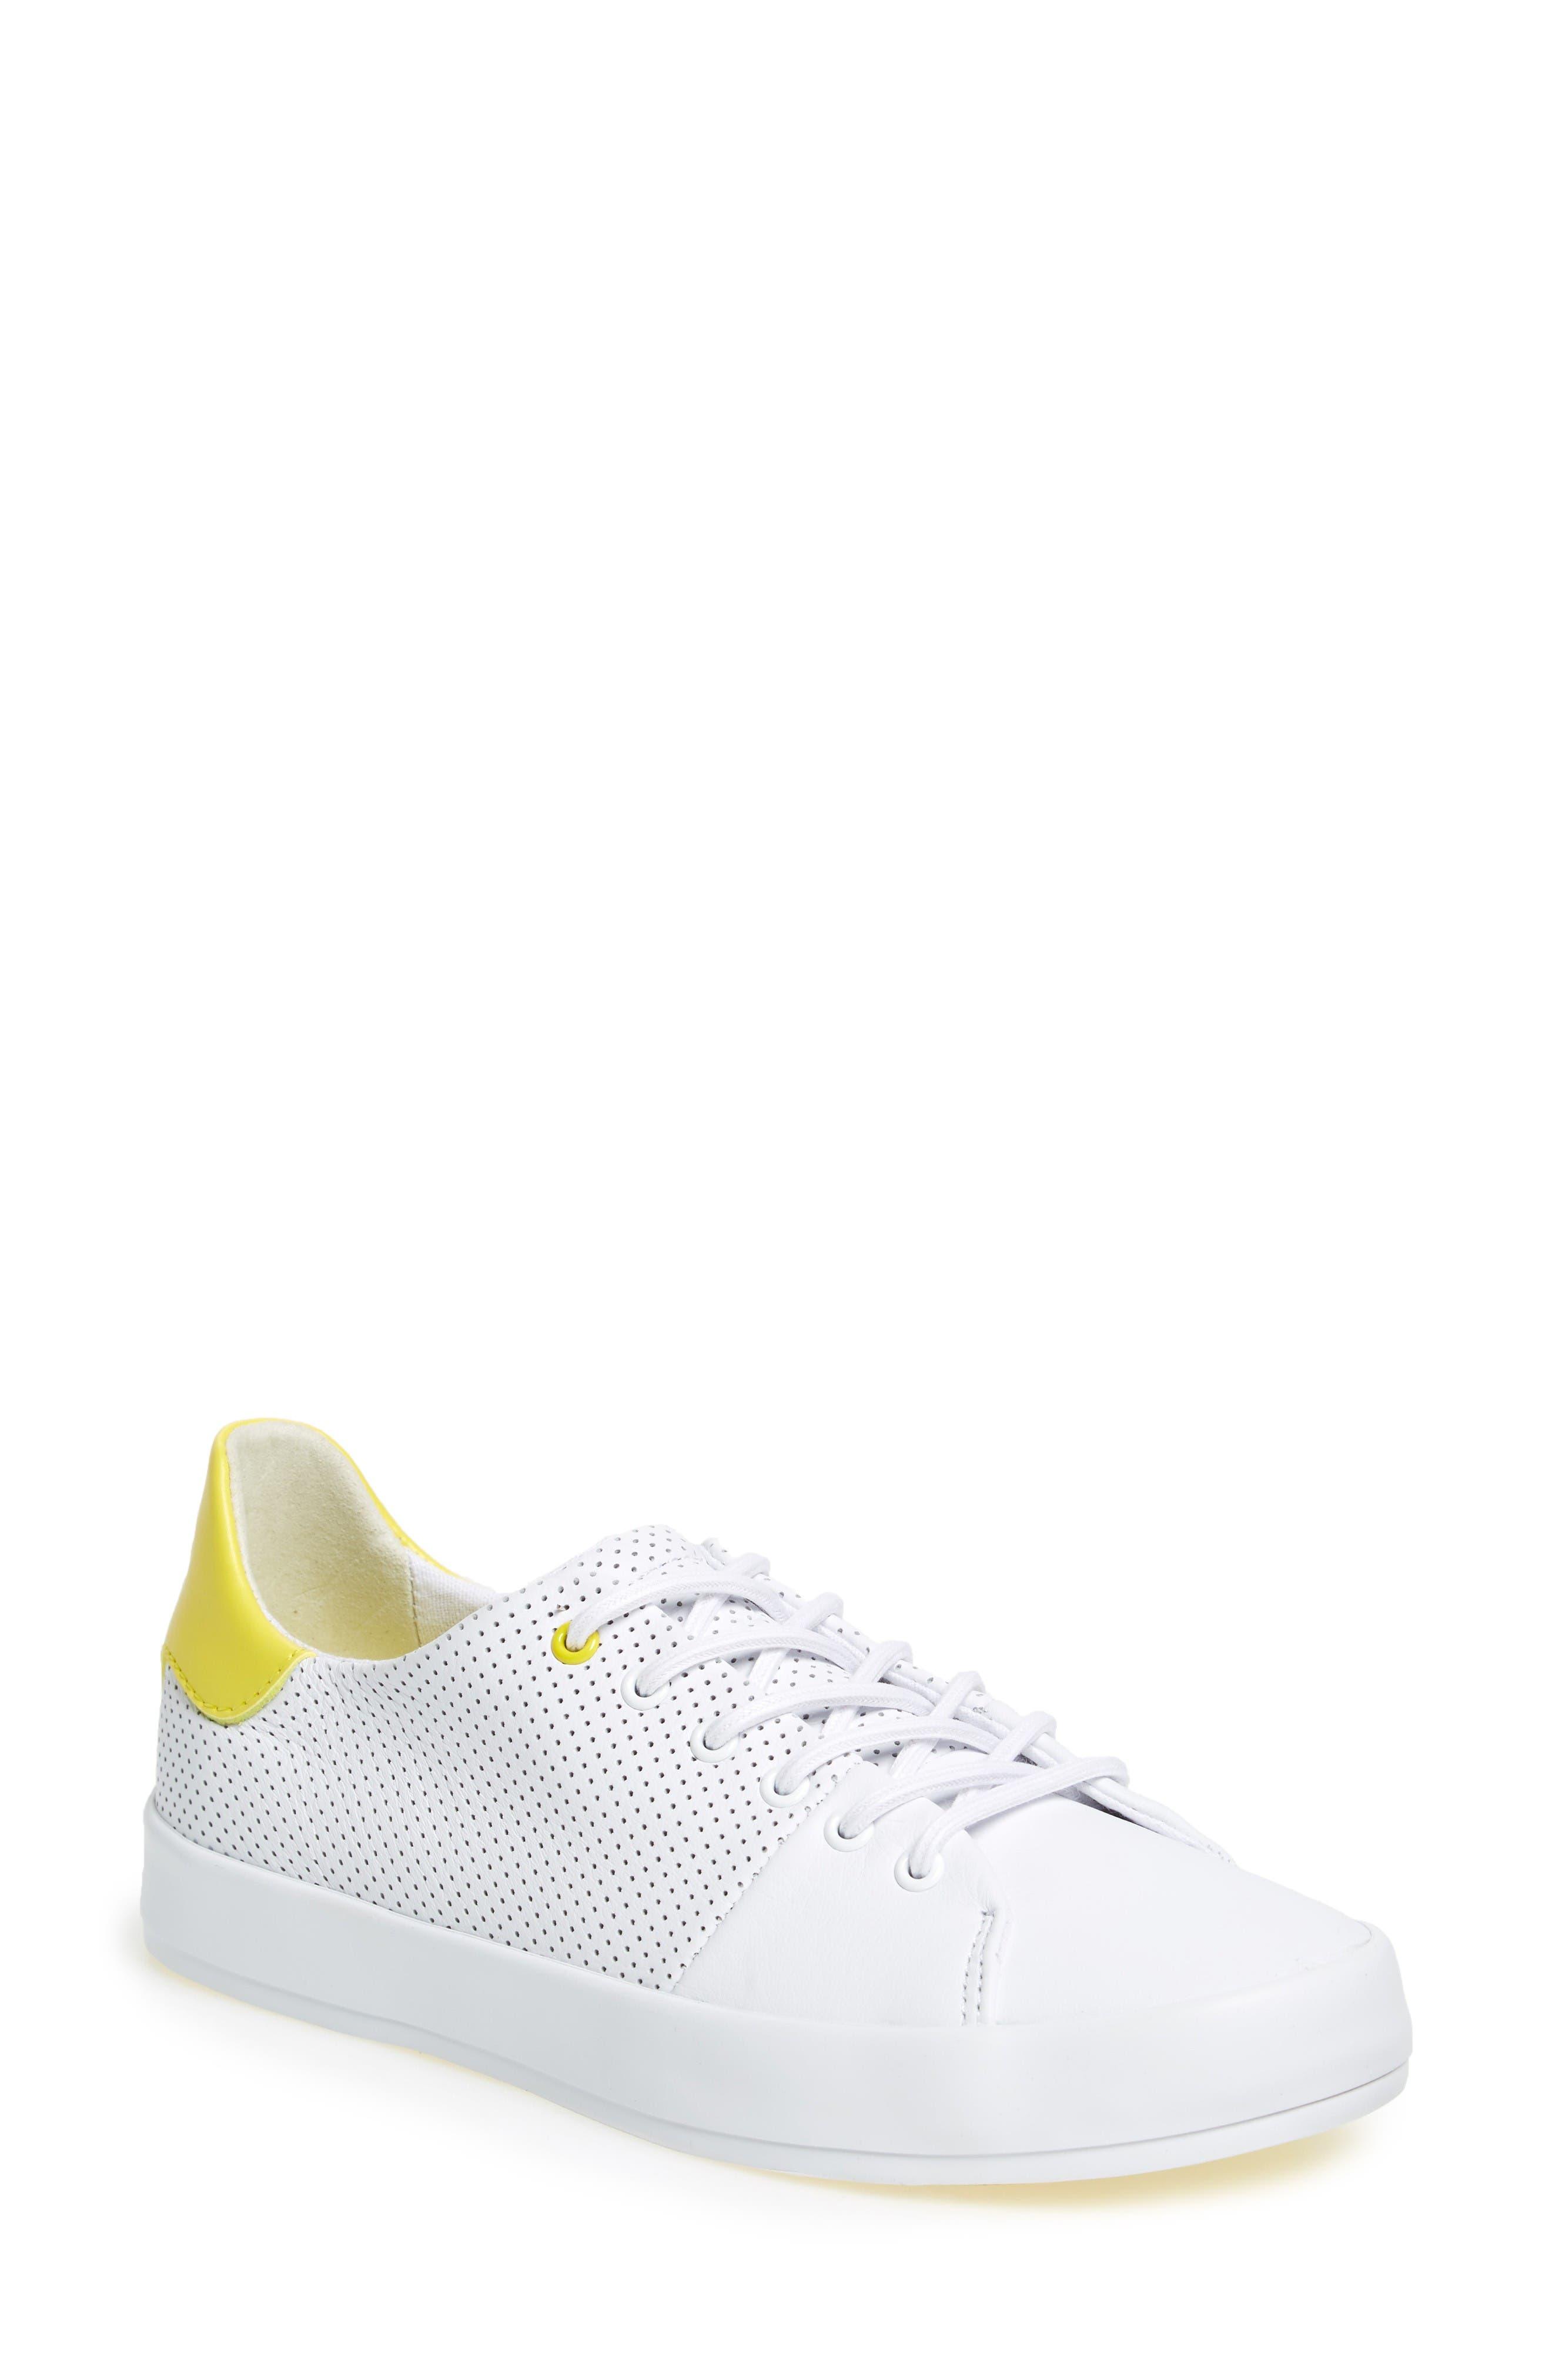 Alternate Image 1 Selected - Creative Recreation x Nick Jonas Carda Perforated Sneaker (Women)